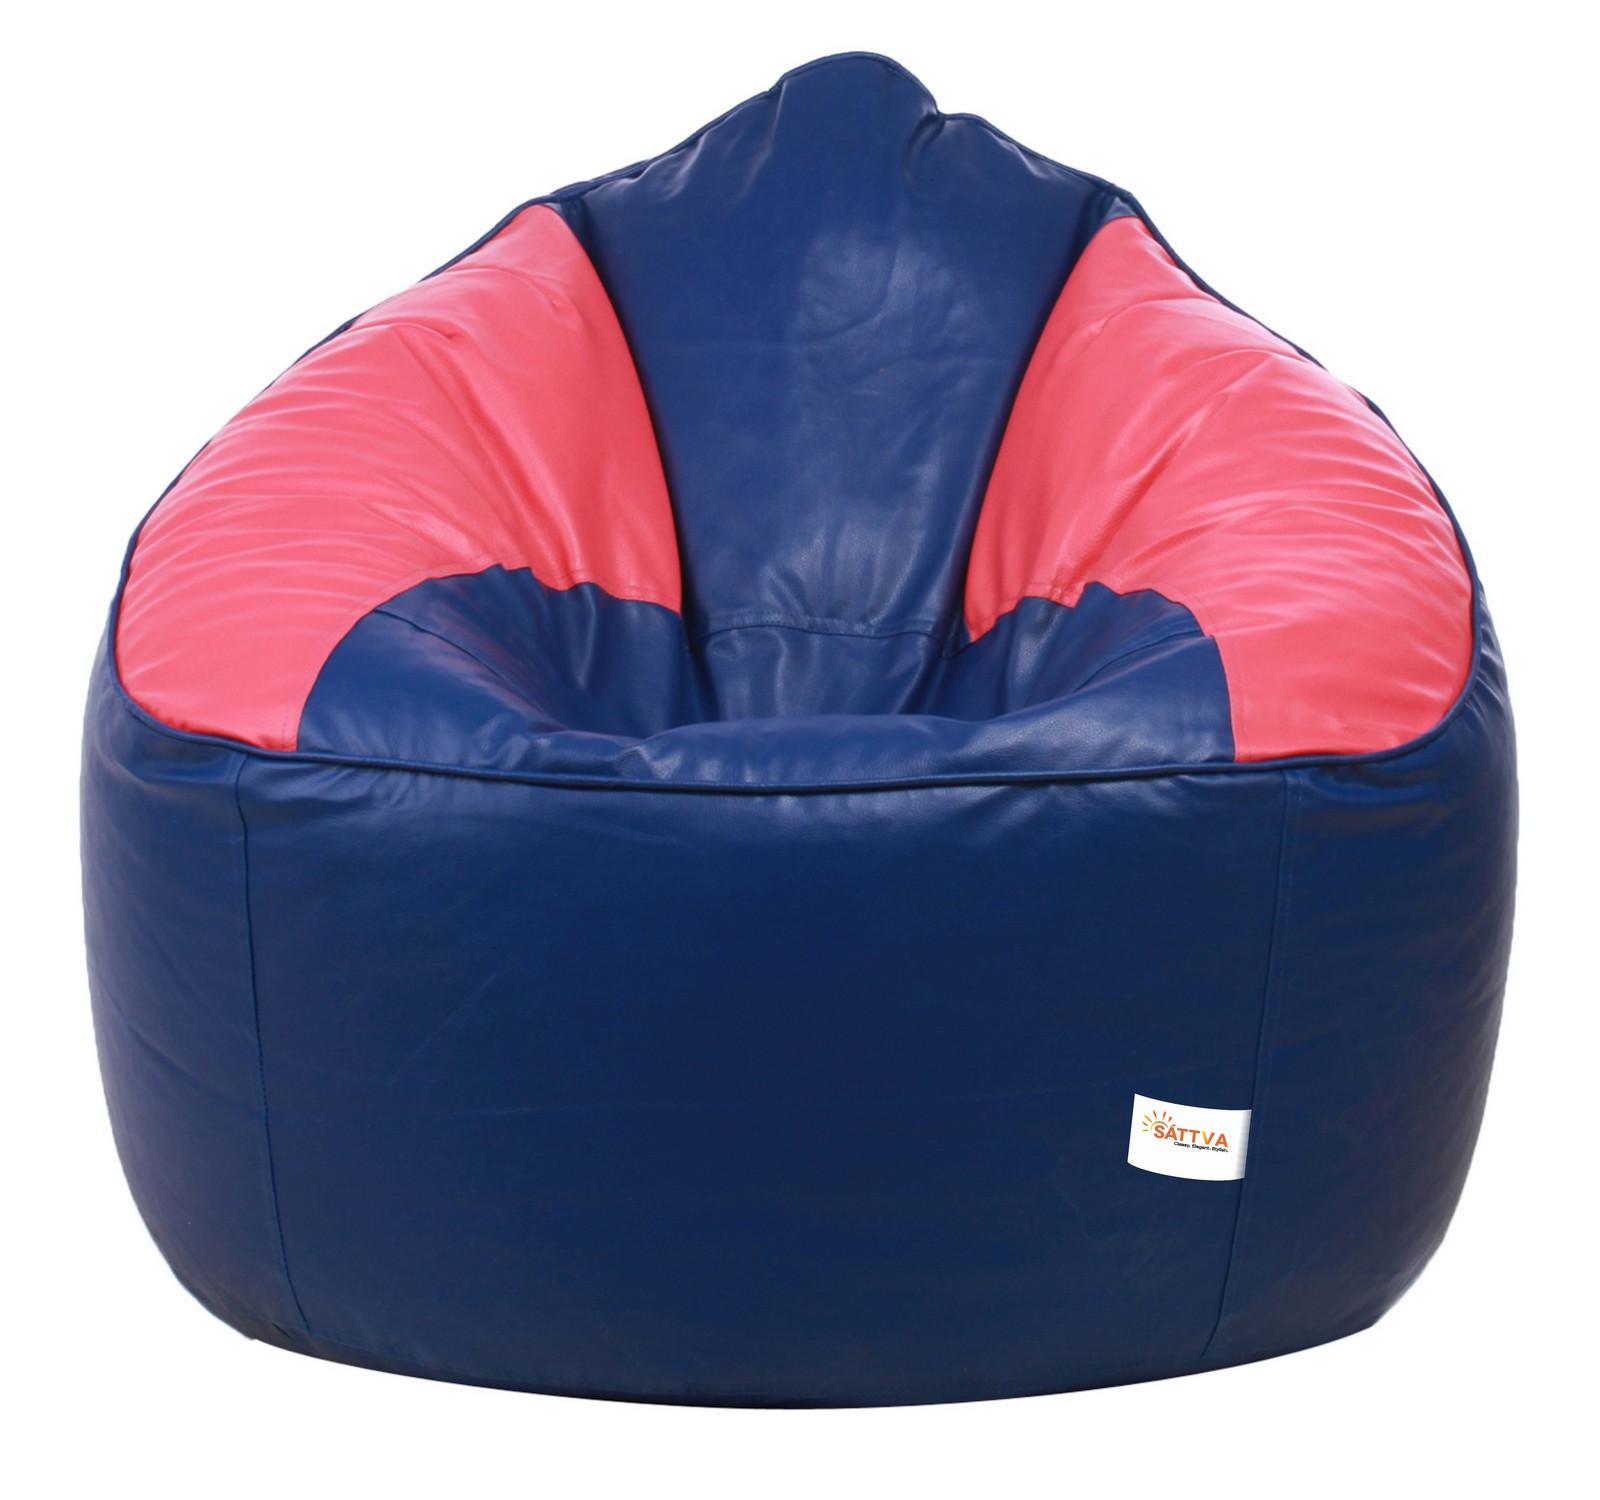 Sattva Combo Muddha Dual Color Bean Bag And Foostool - Filled Black Red - XXXL (Royal Blue Pink, XXXL)